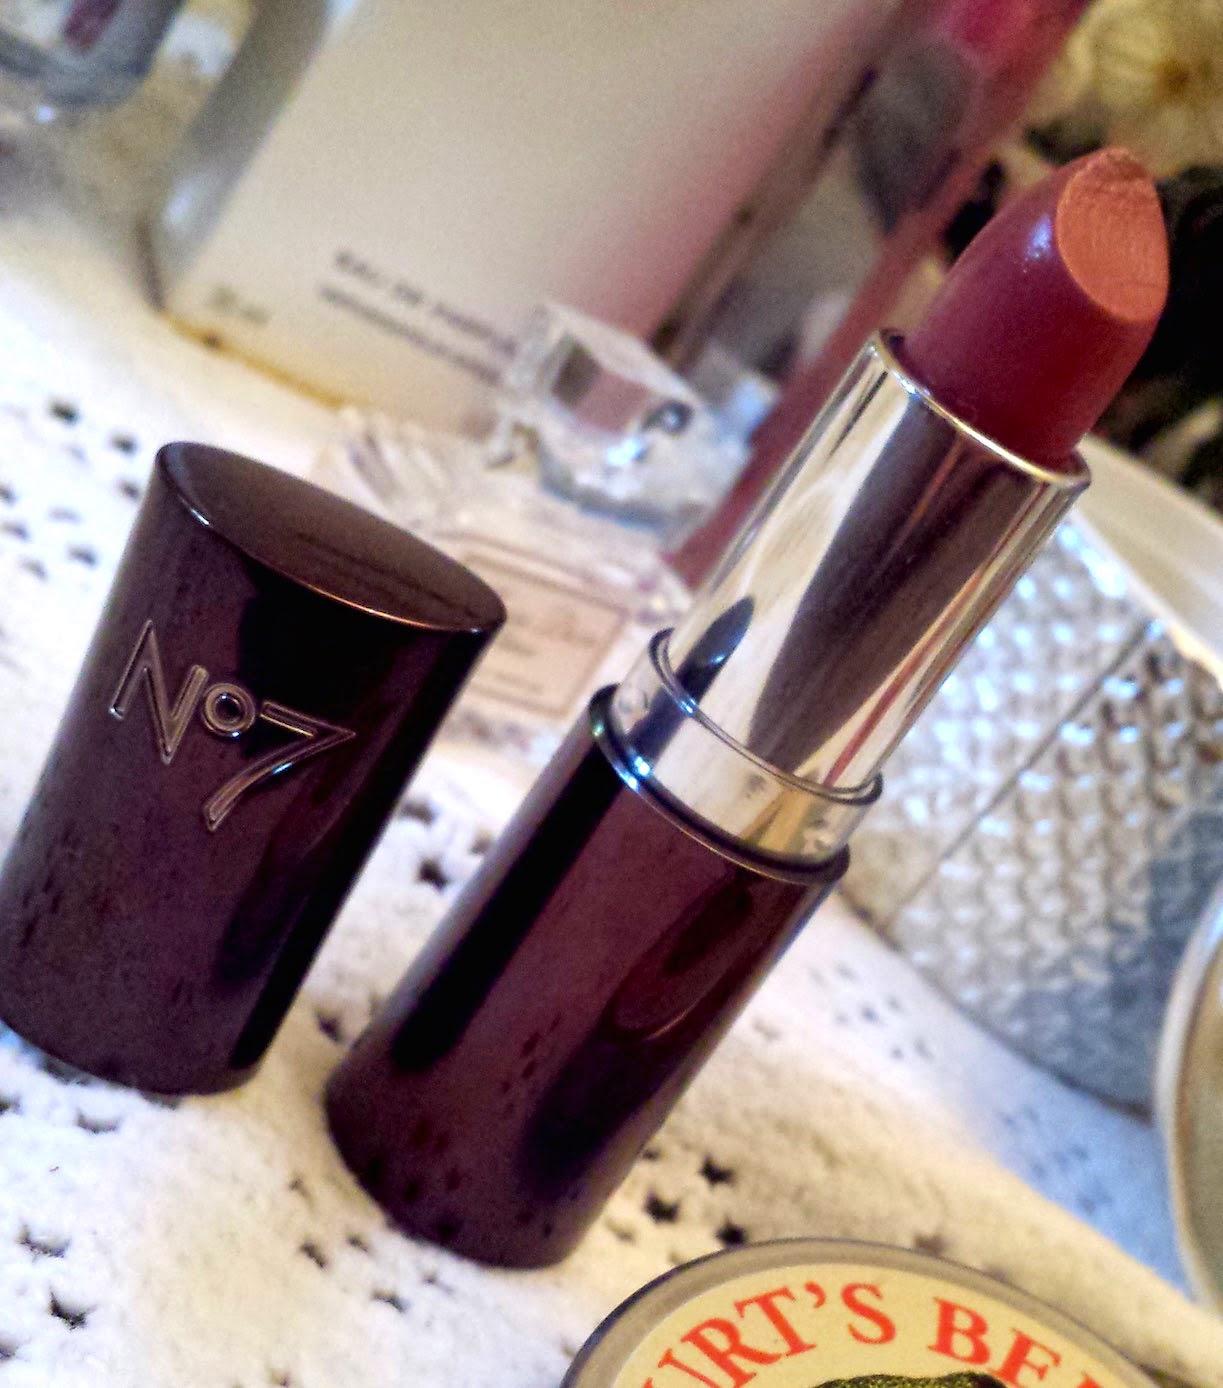 No7 Moisture Drench Lipstick in Chic